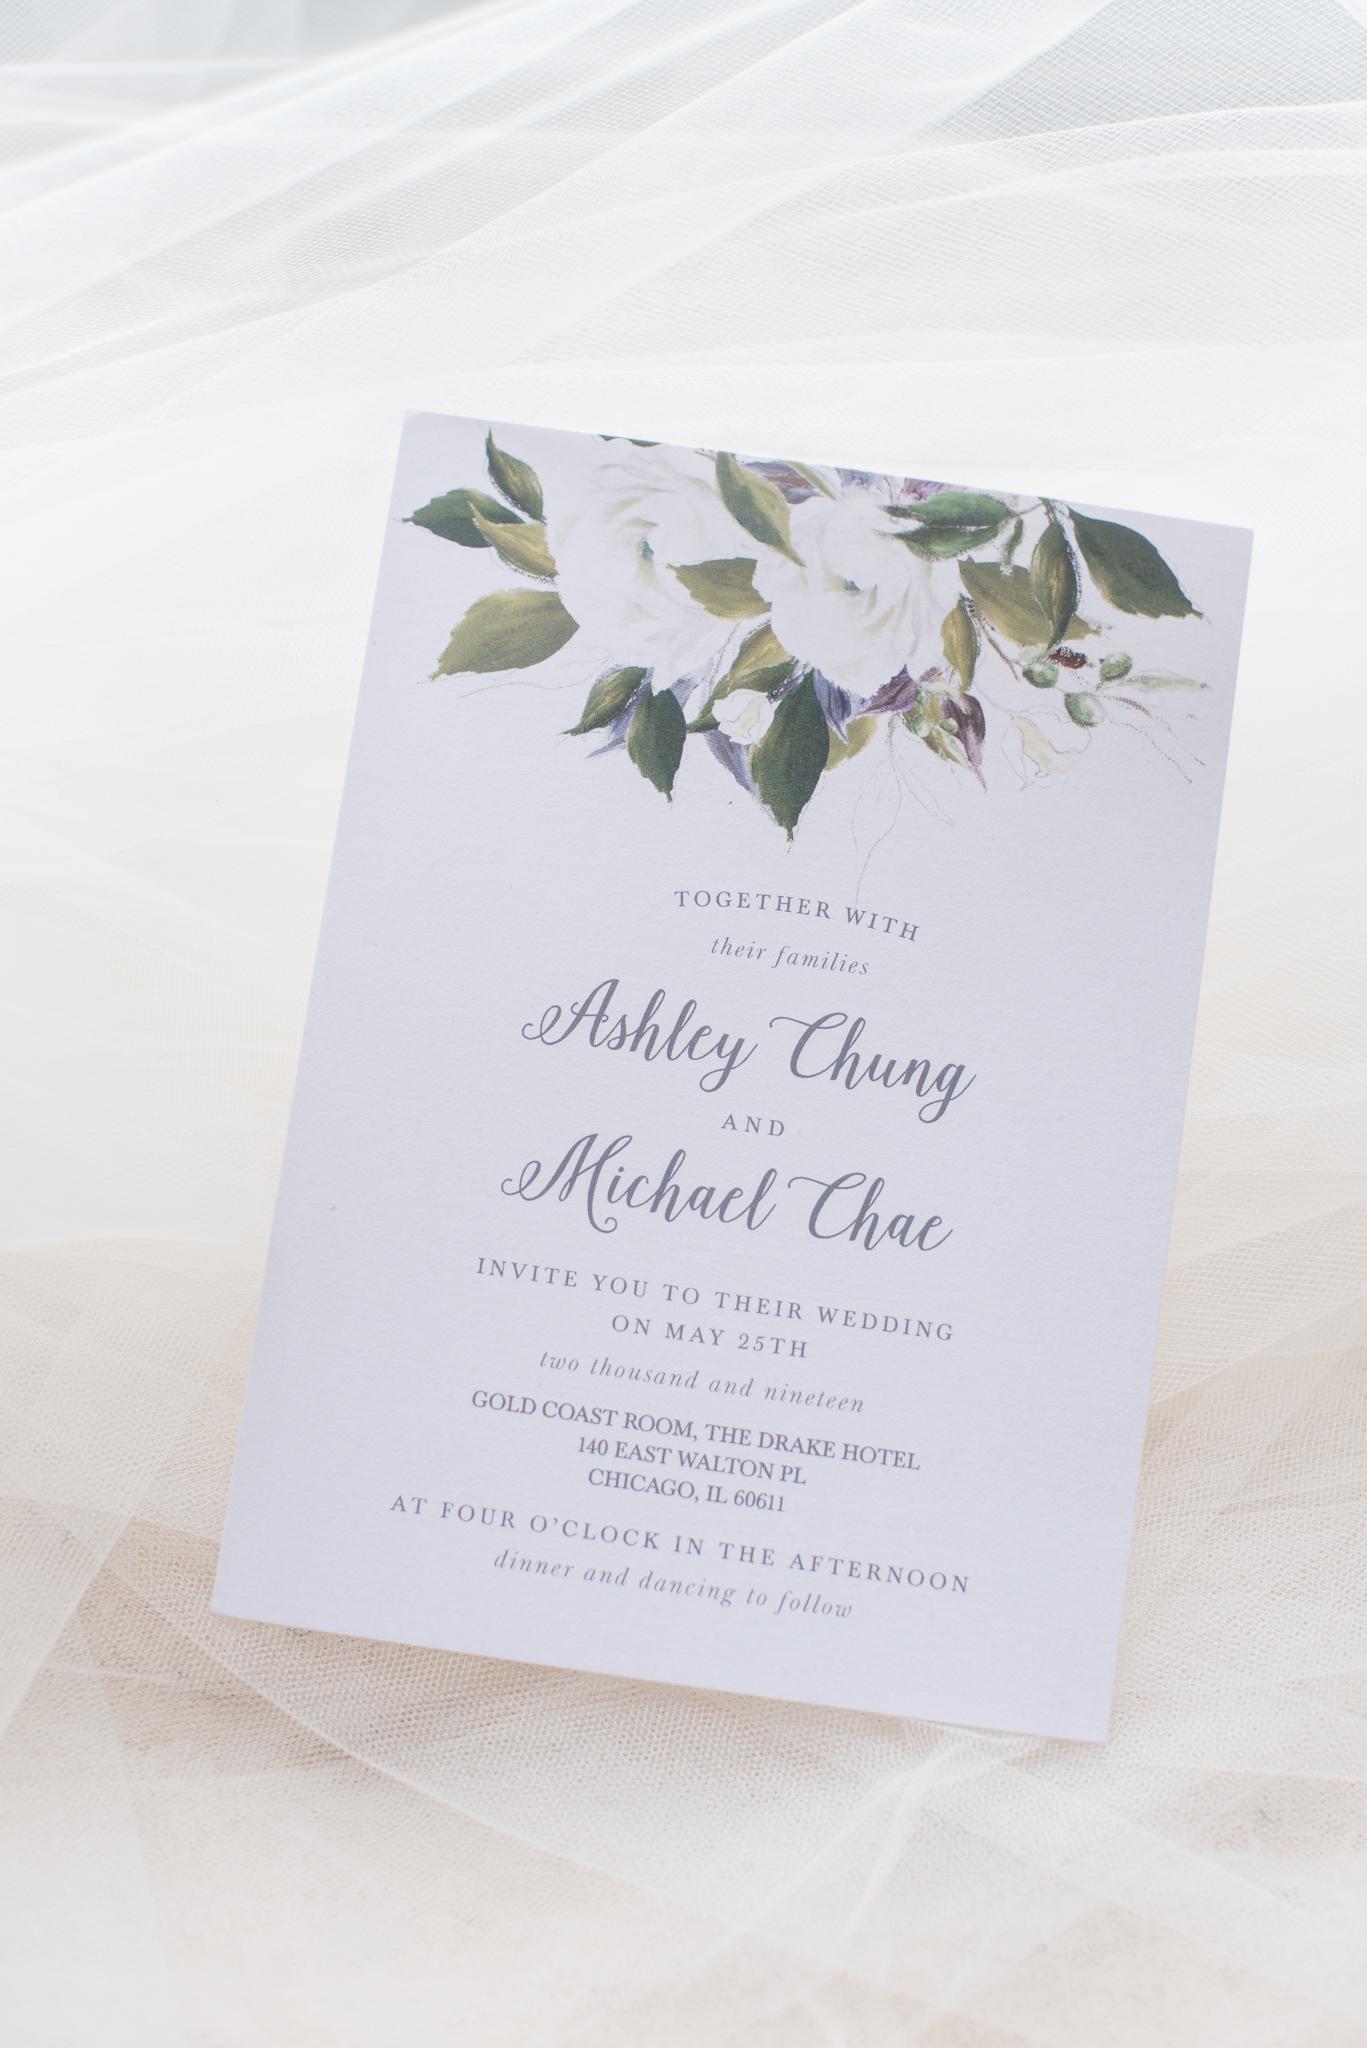 Downtown Chicago Wedding Photographer-16.jpg